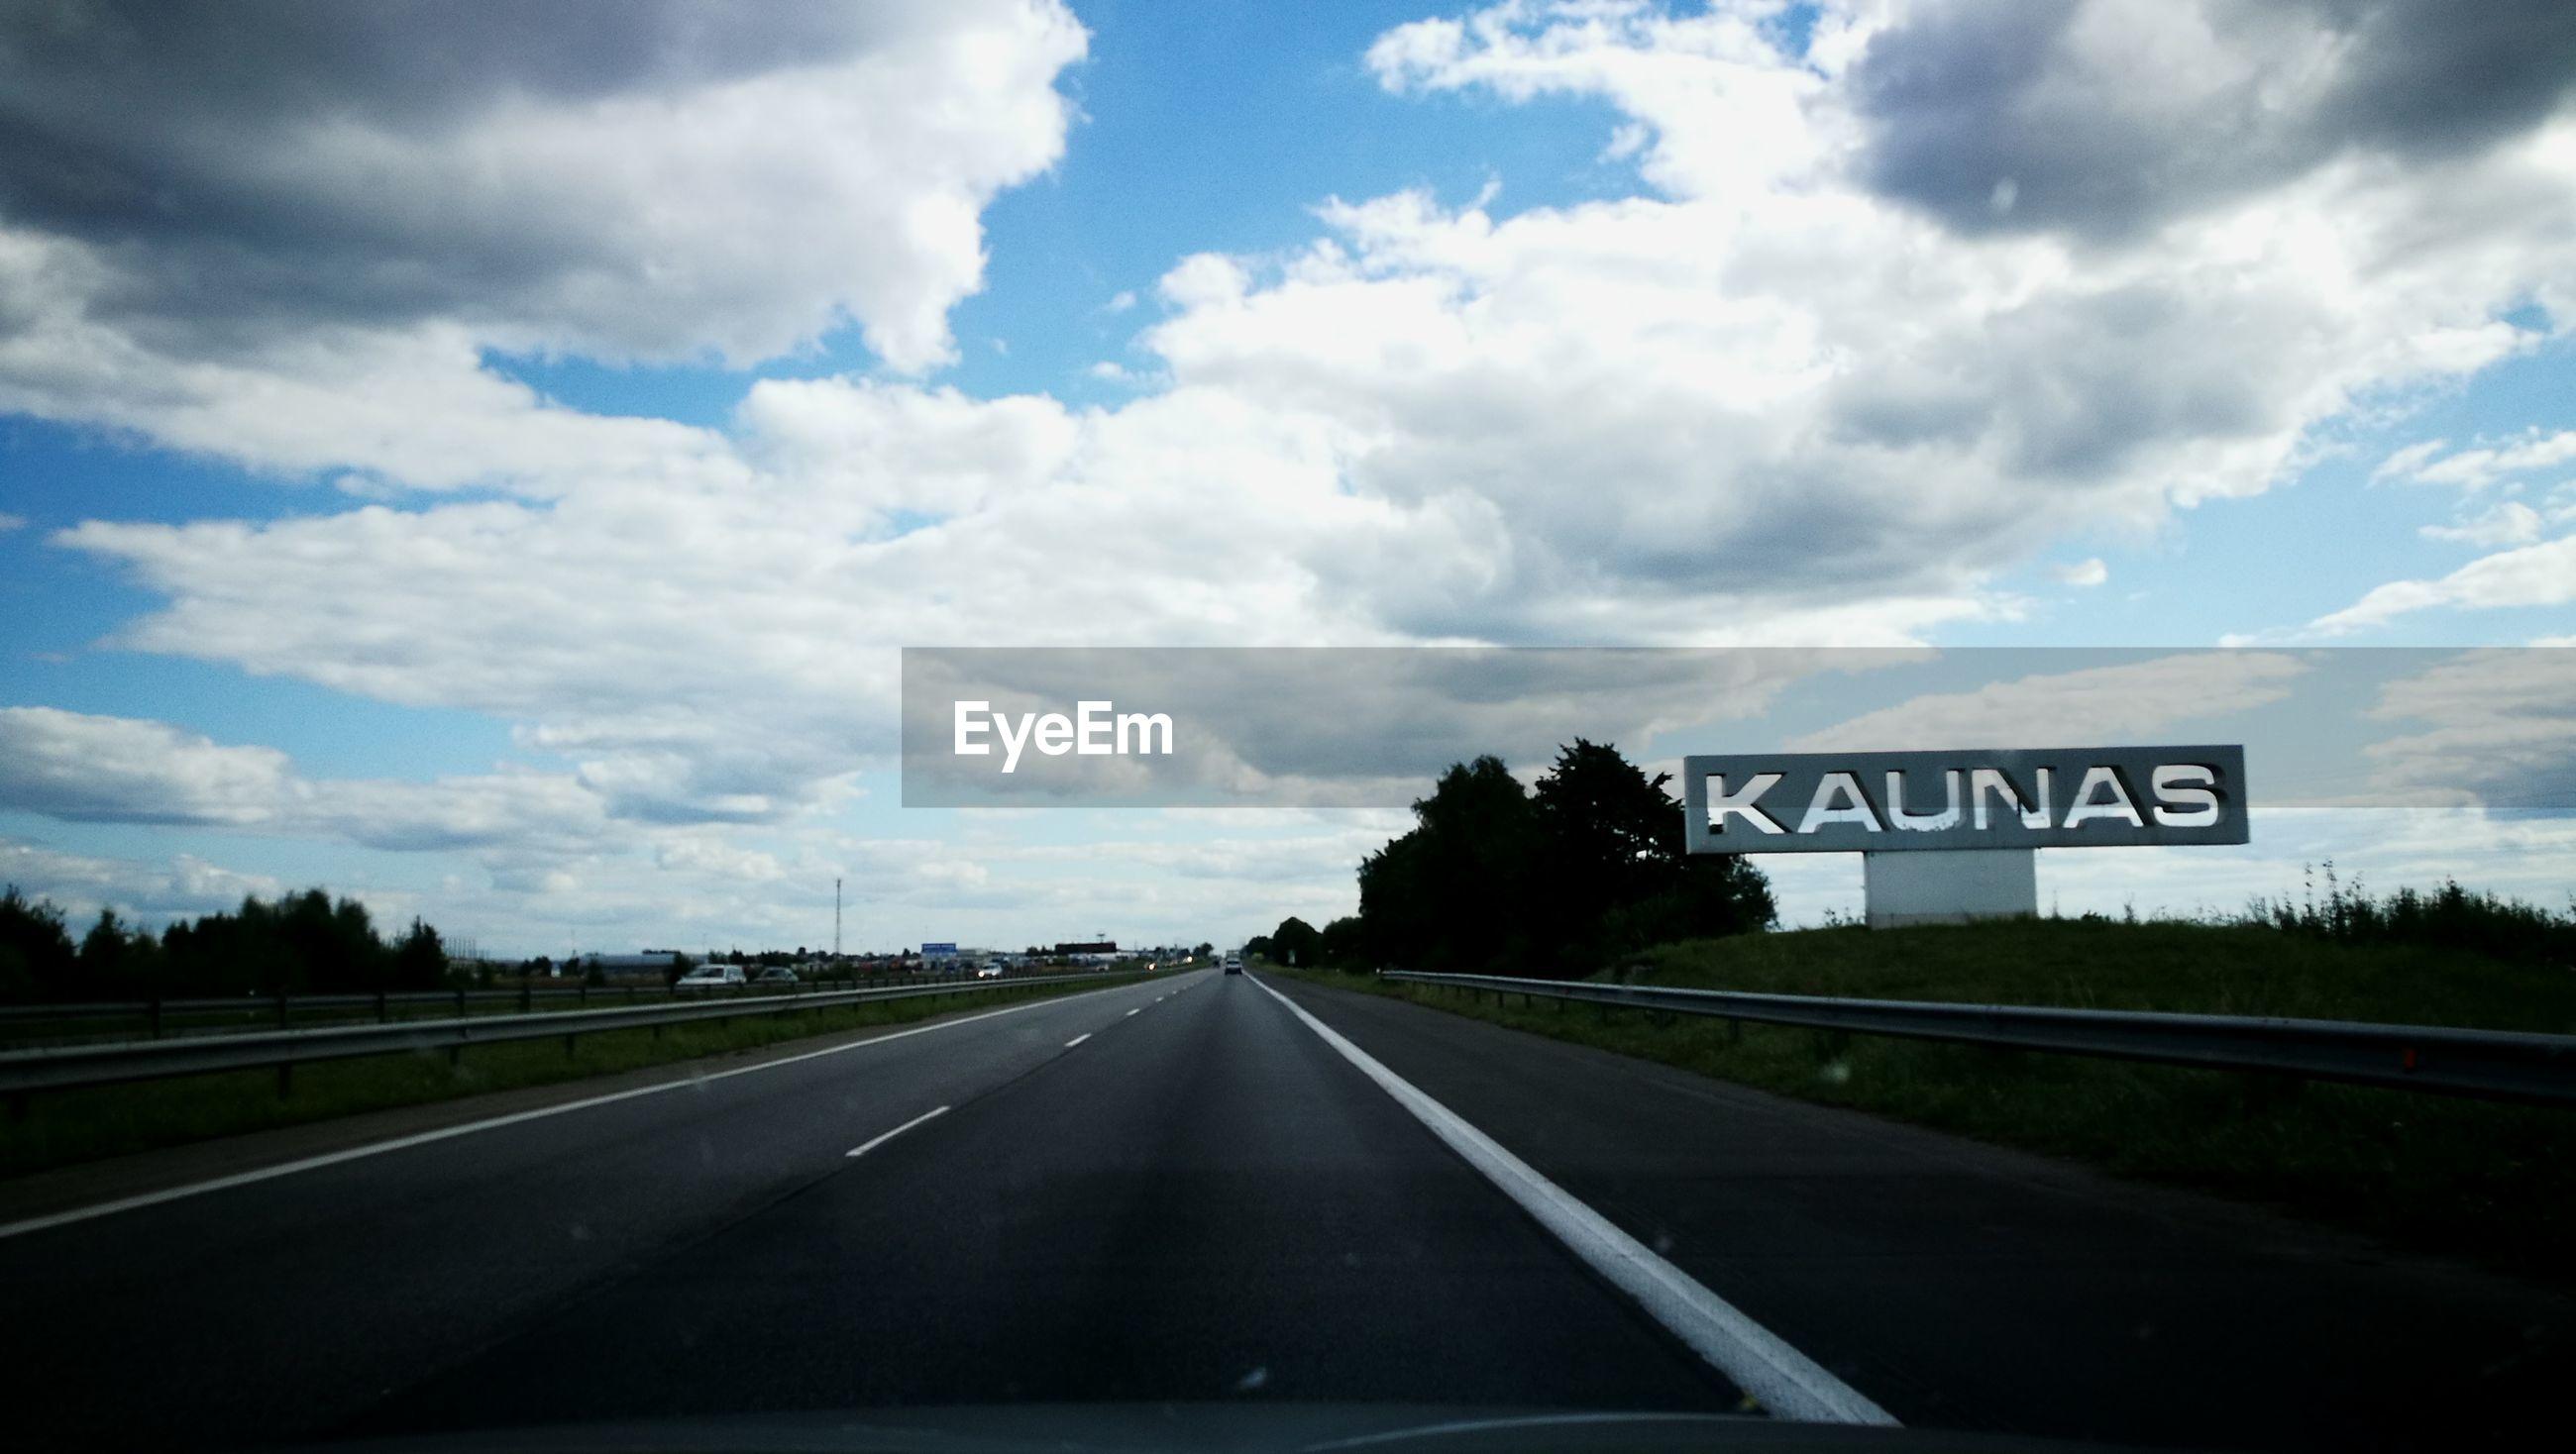 Road against cloudy sky seen through car windshield